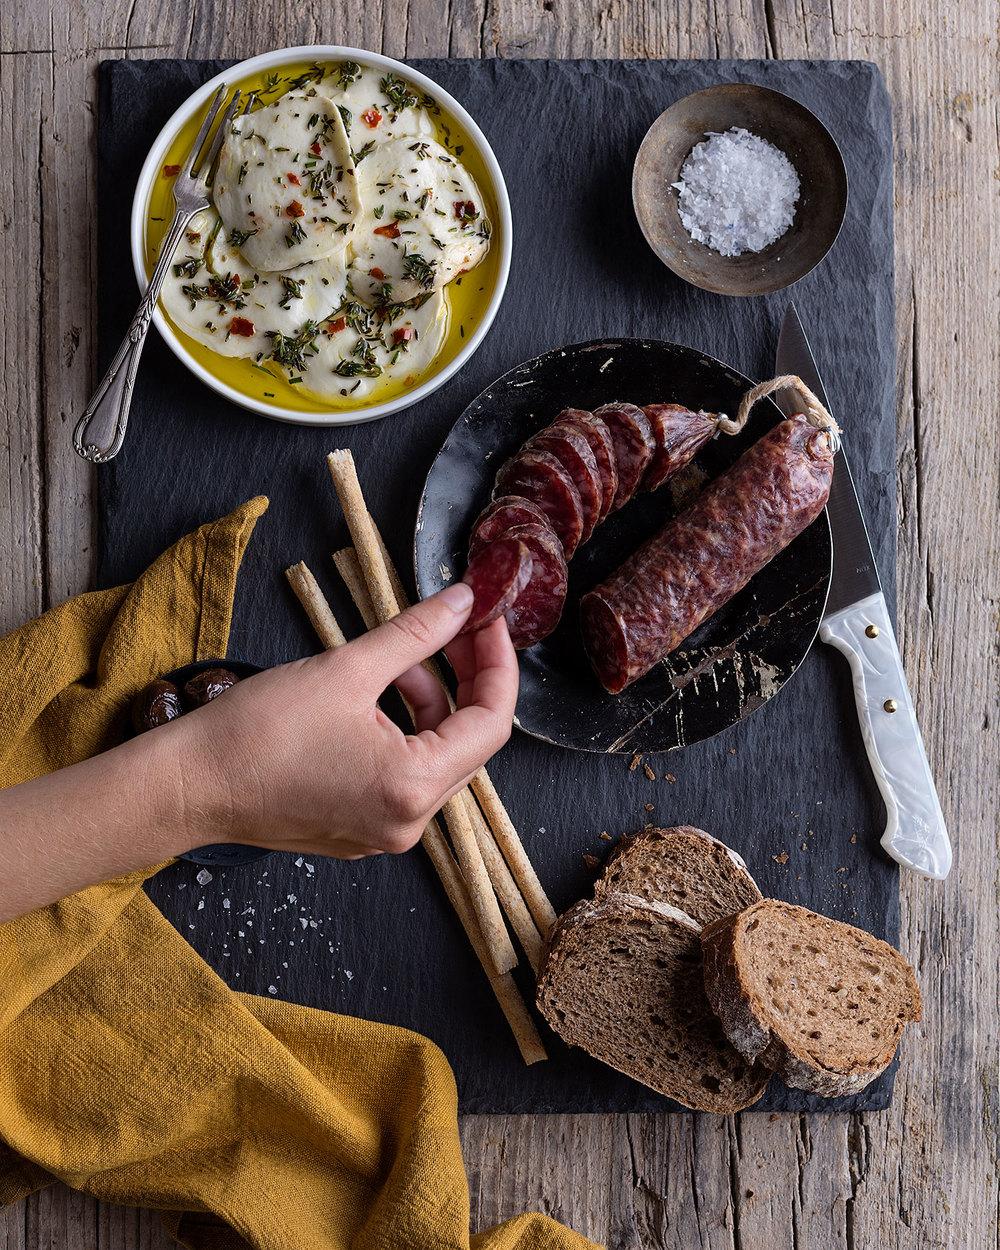 corina-landa-food-photography-fotografia-gastronomica-66.jpg